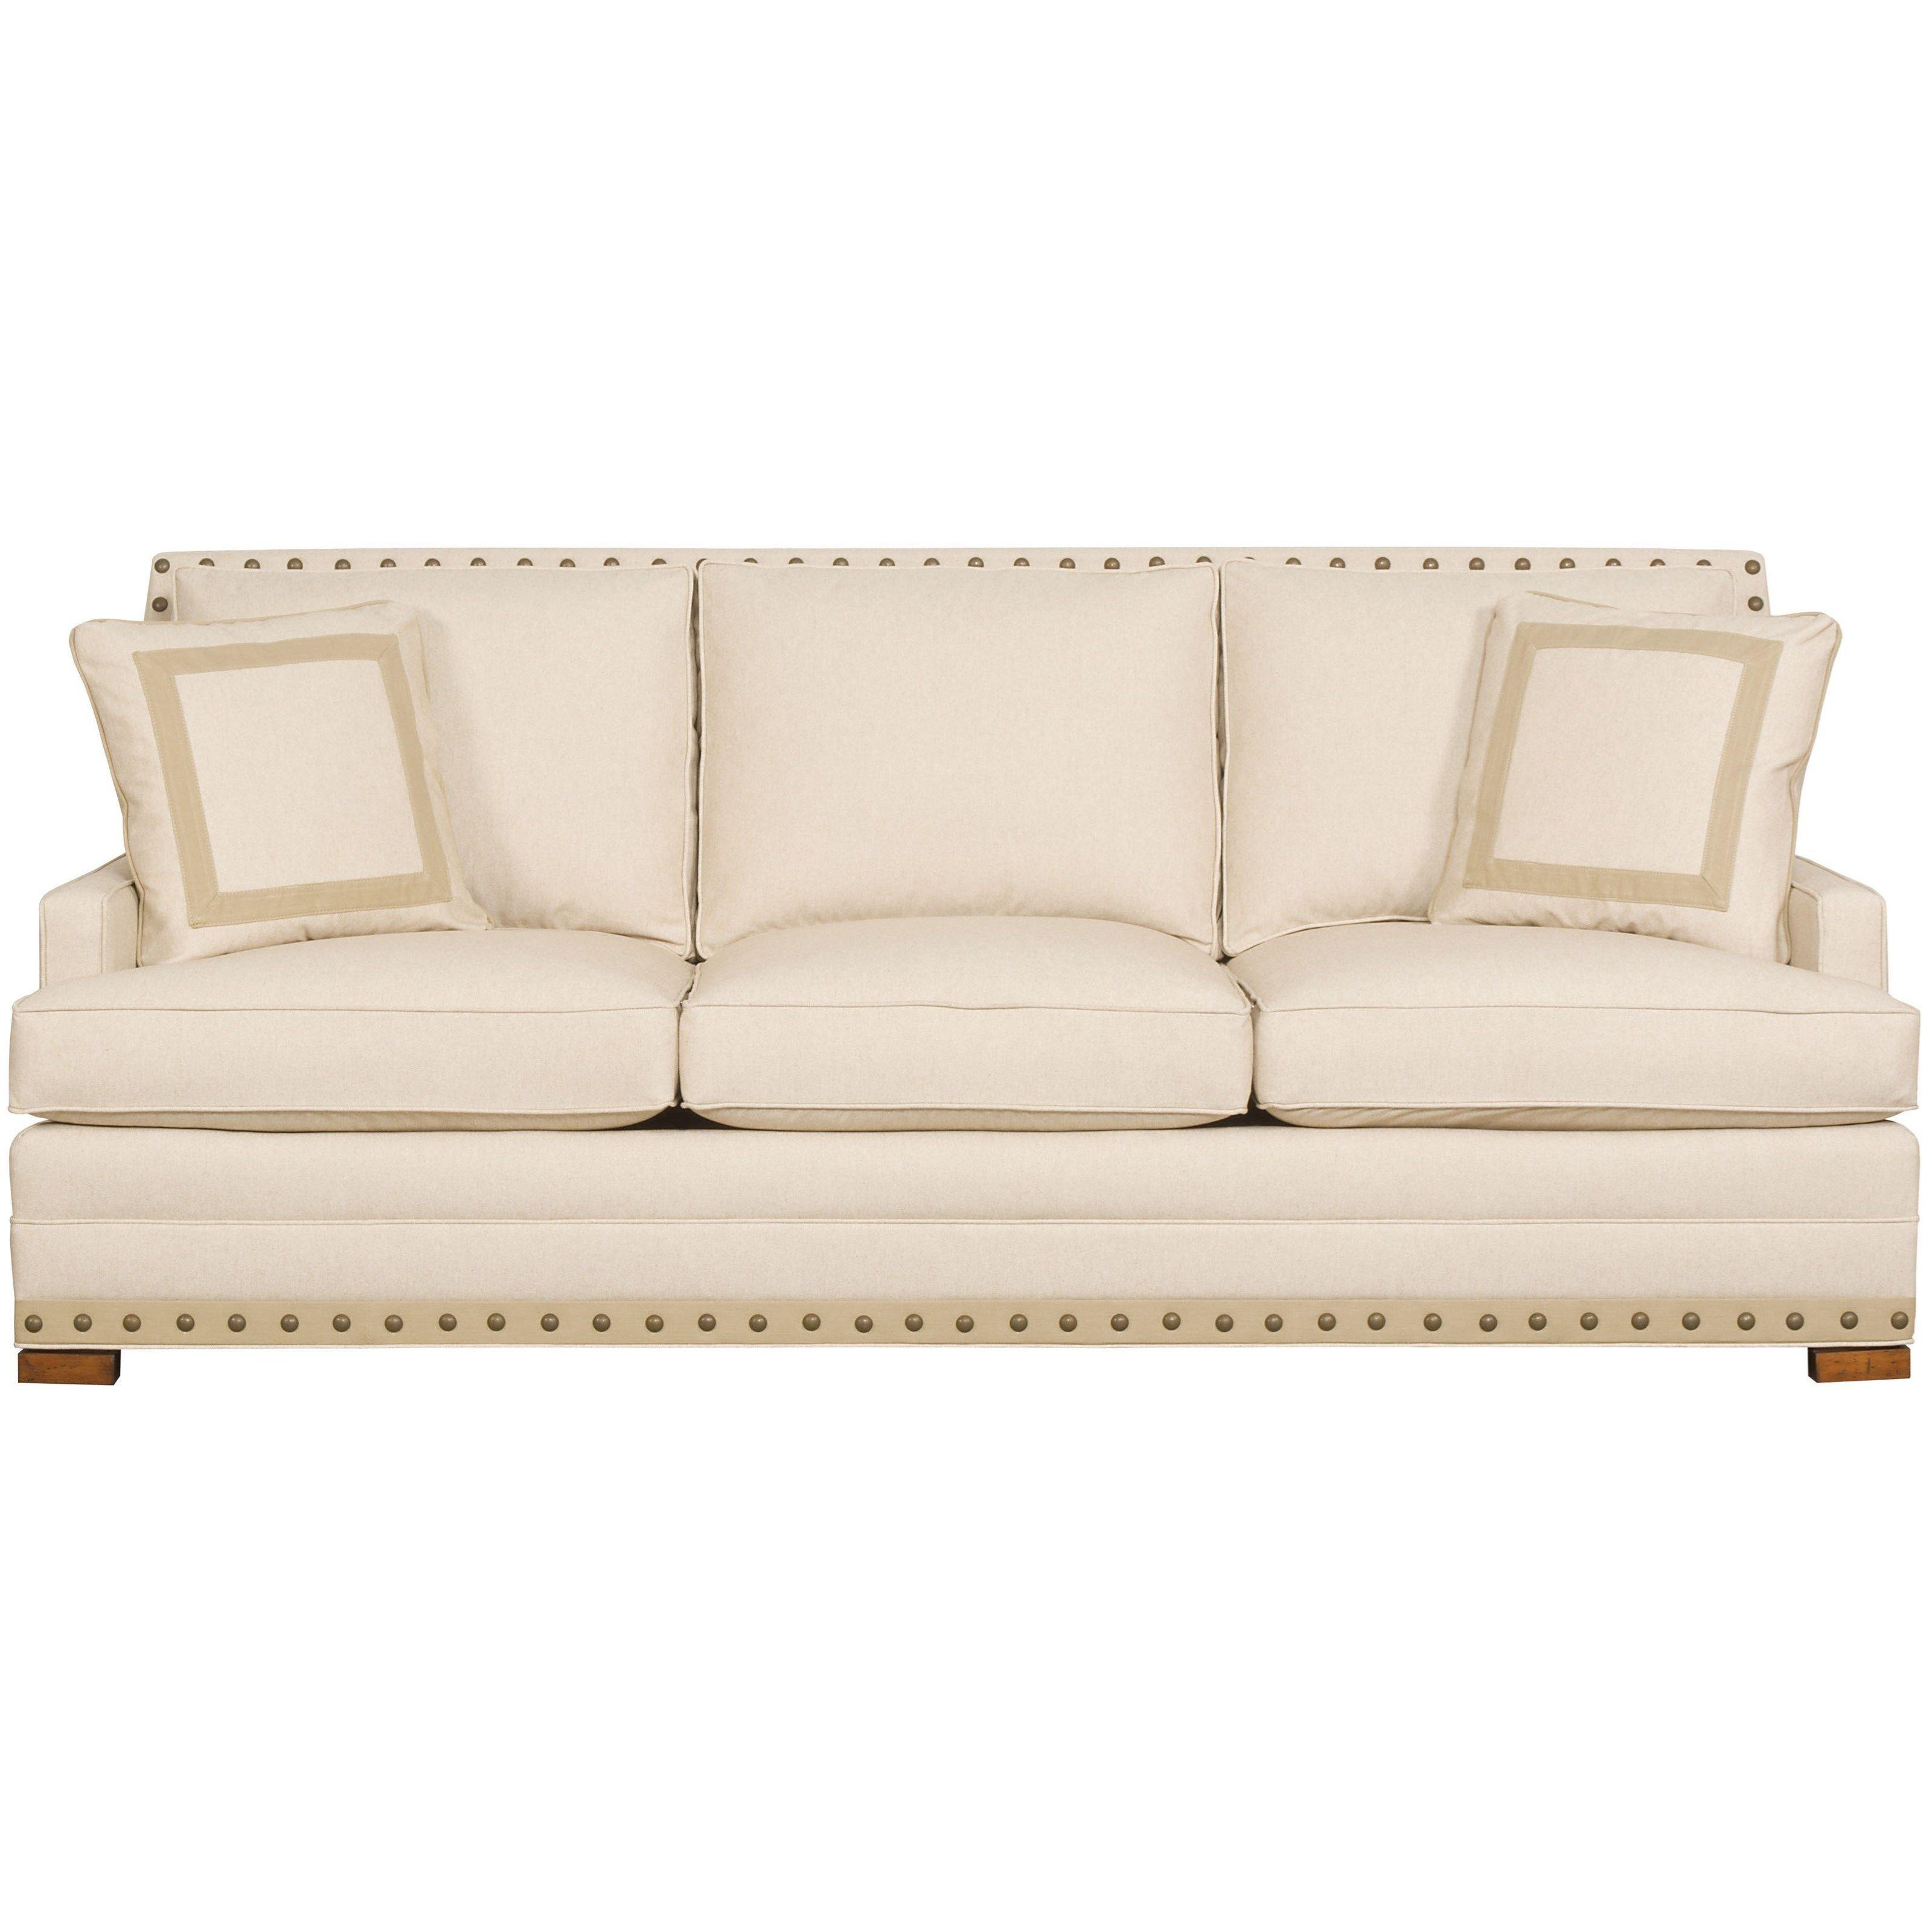 american bungalow riverside 3 seat sofa by vanguard furniture